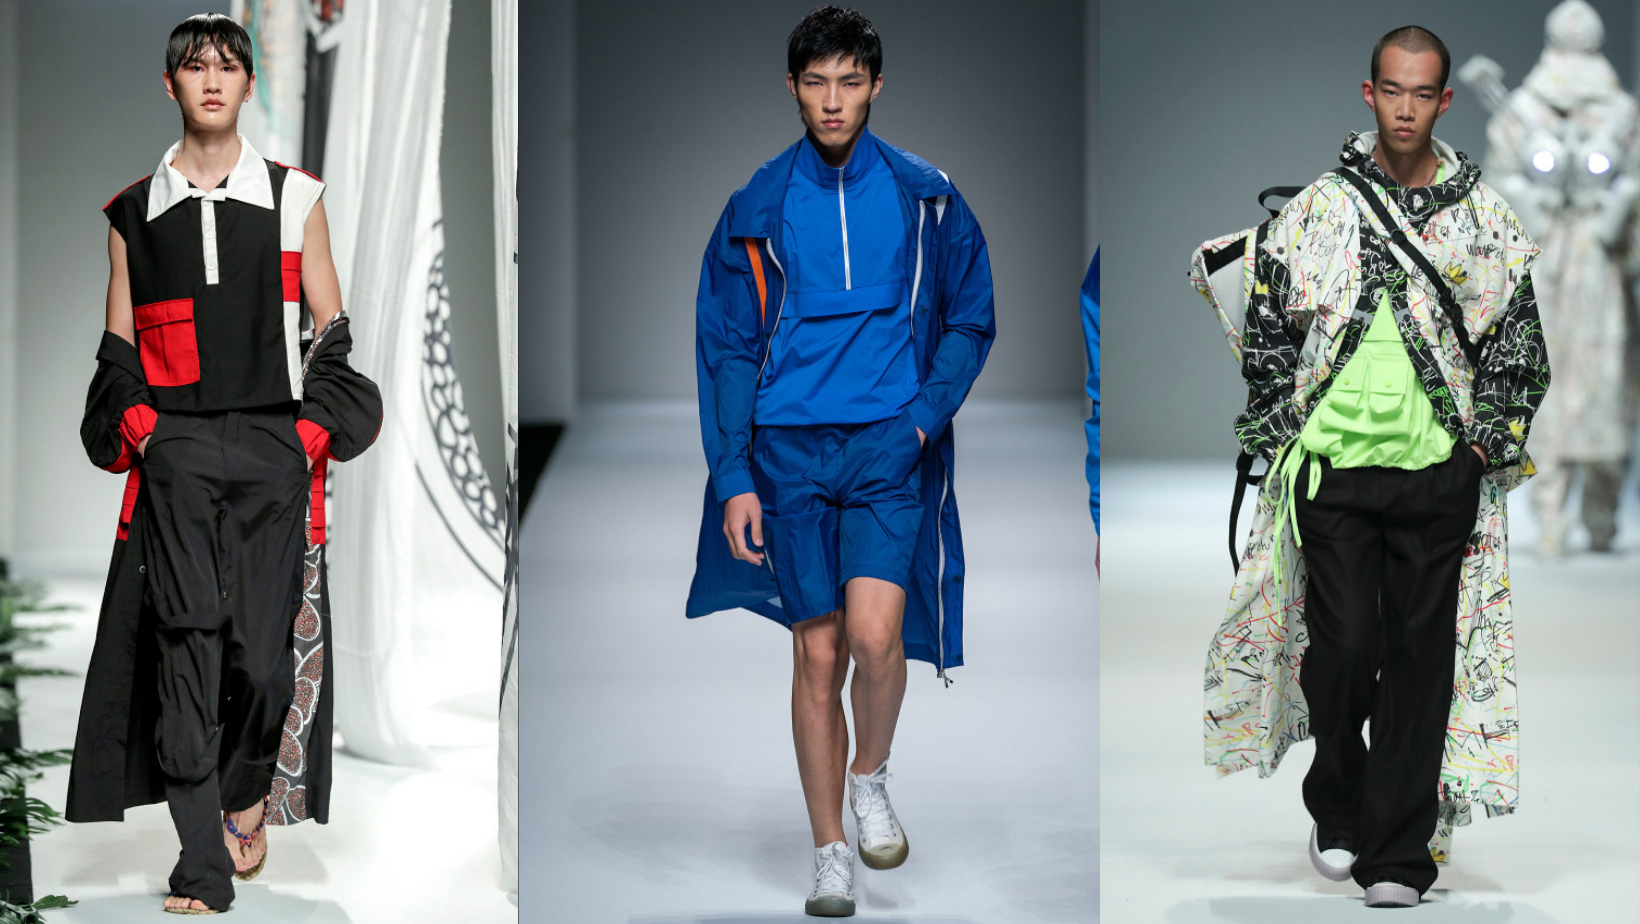 Shanghai Fashion Week Postponed To Early April Shanghai Fashion Week Postponed To Early April Vanity Teen 虚荣青年 Menswear & new faces magazine